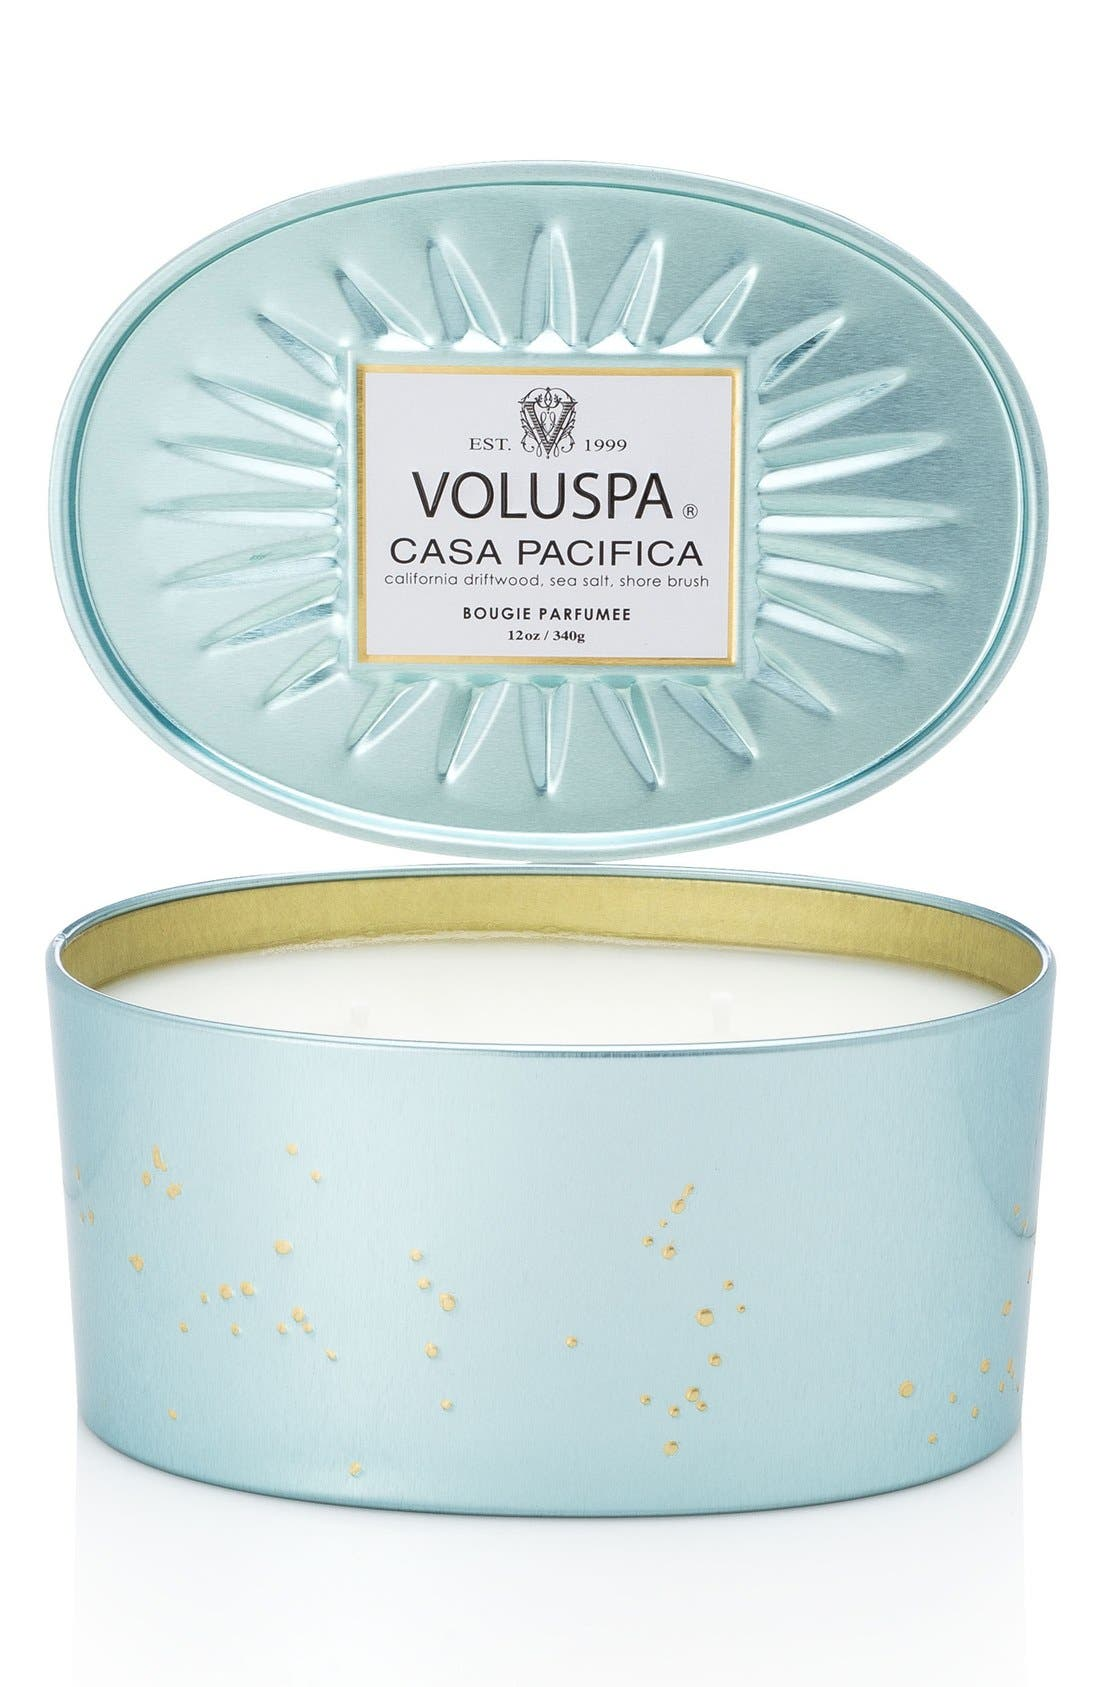 Voluspa'Vermeil- Casa Pacifica' Two-Wick Candle